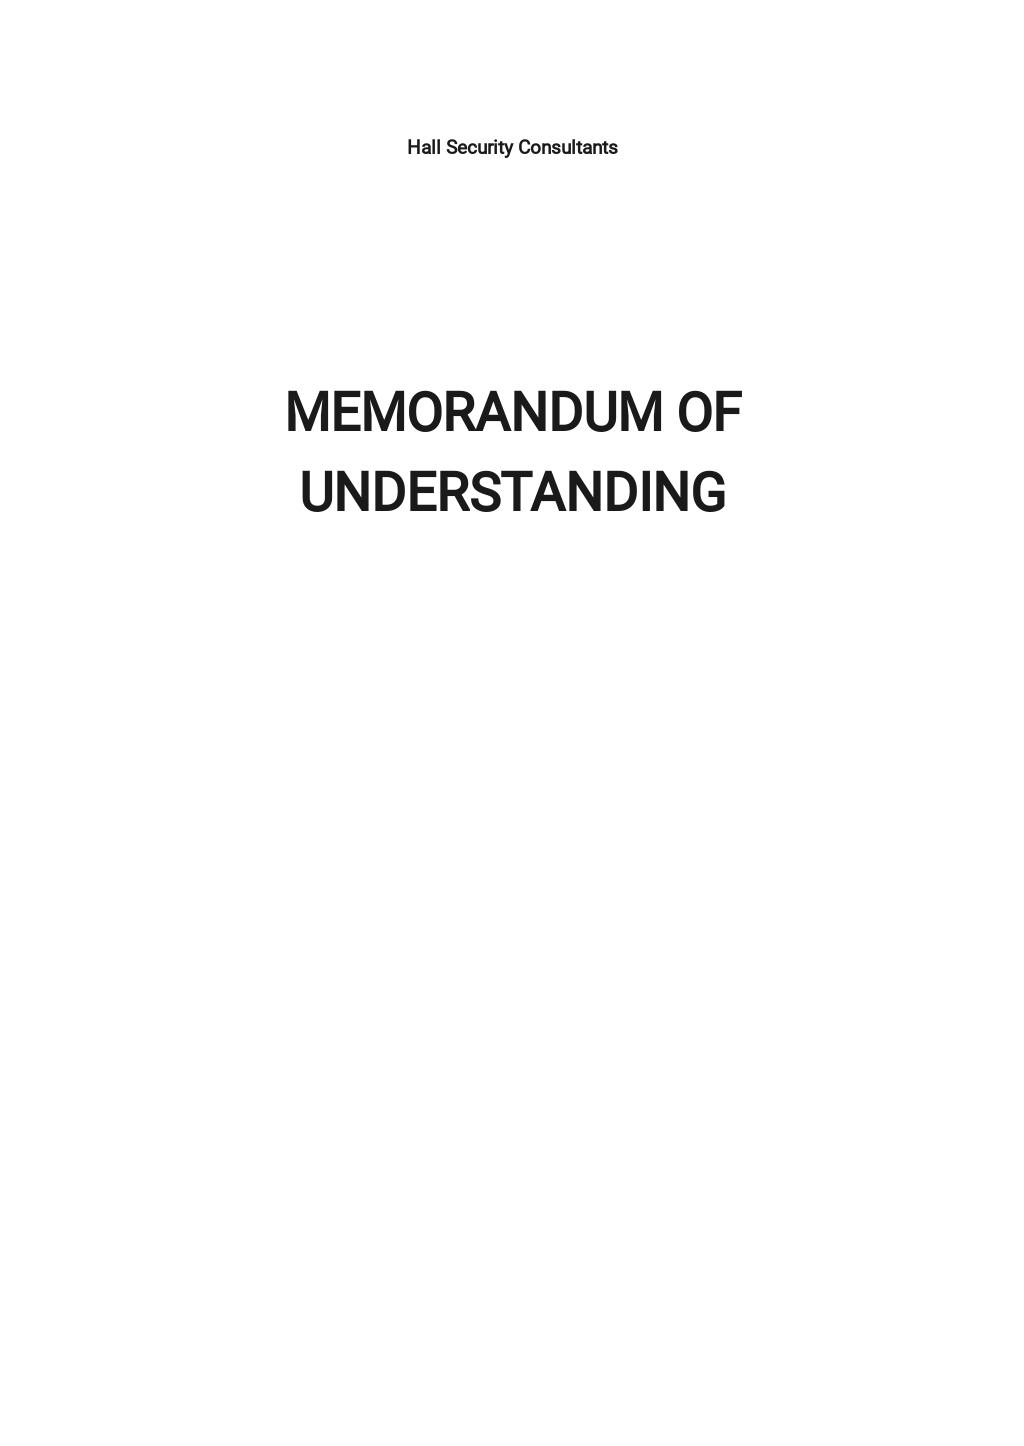 Sample Memorandum of Understanding Template.jpe